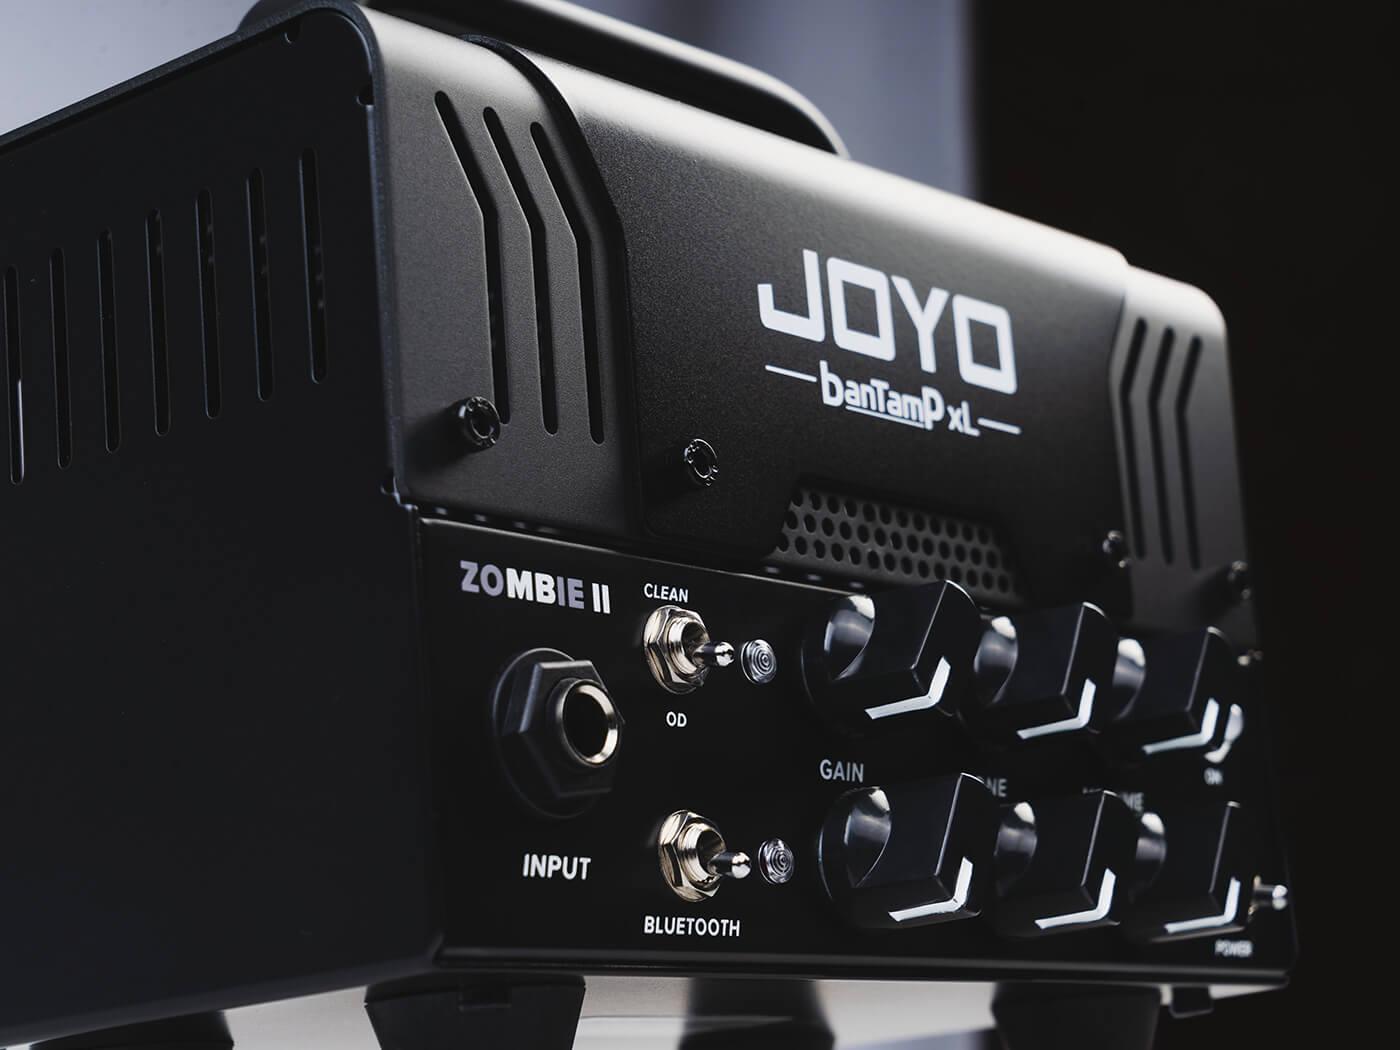 Joyo XL Zombie II